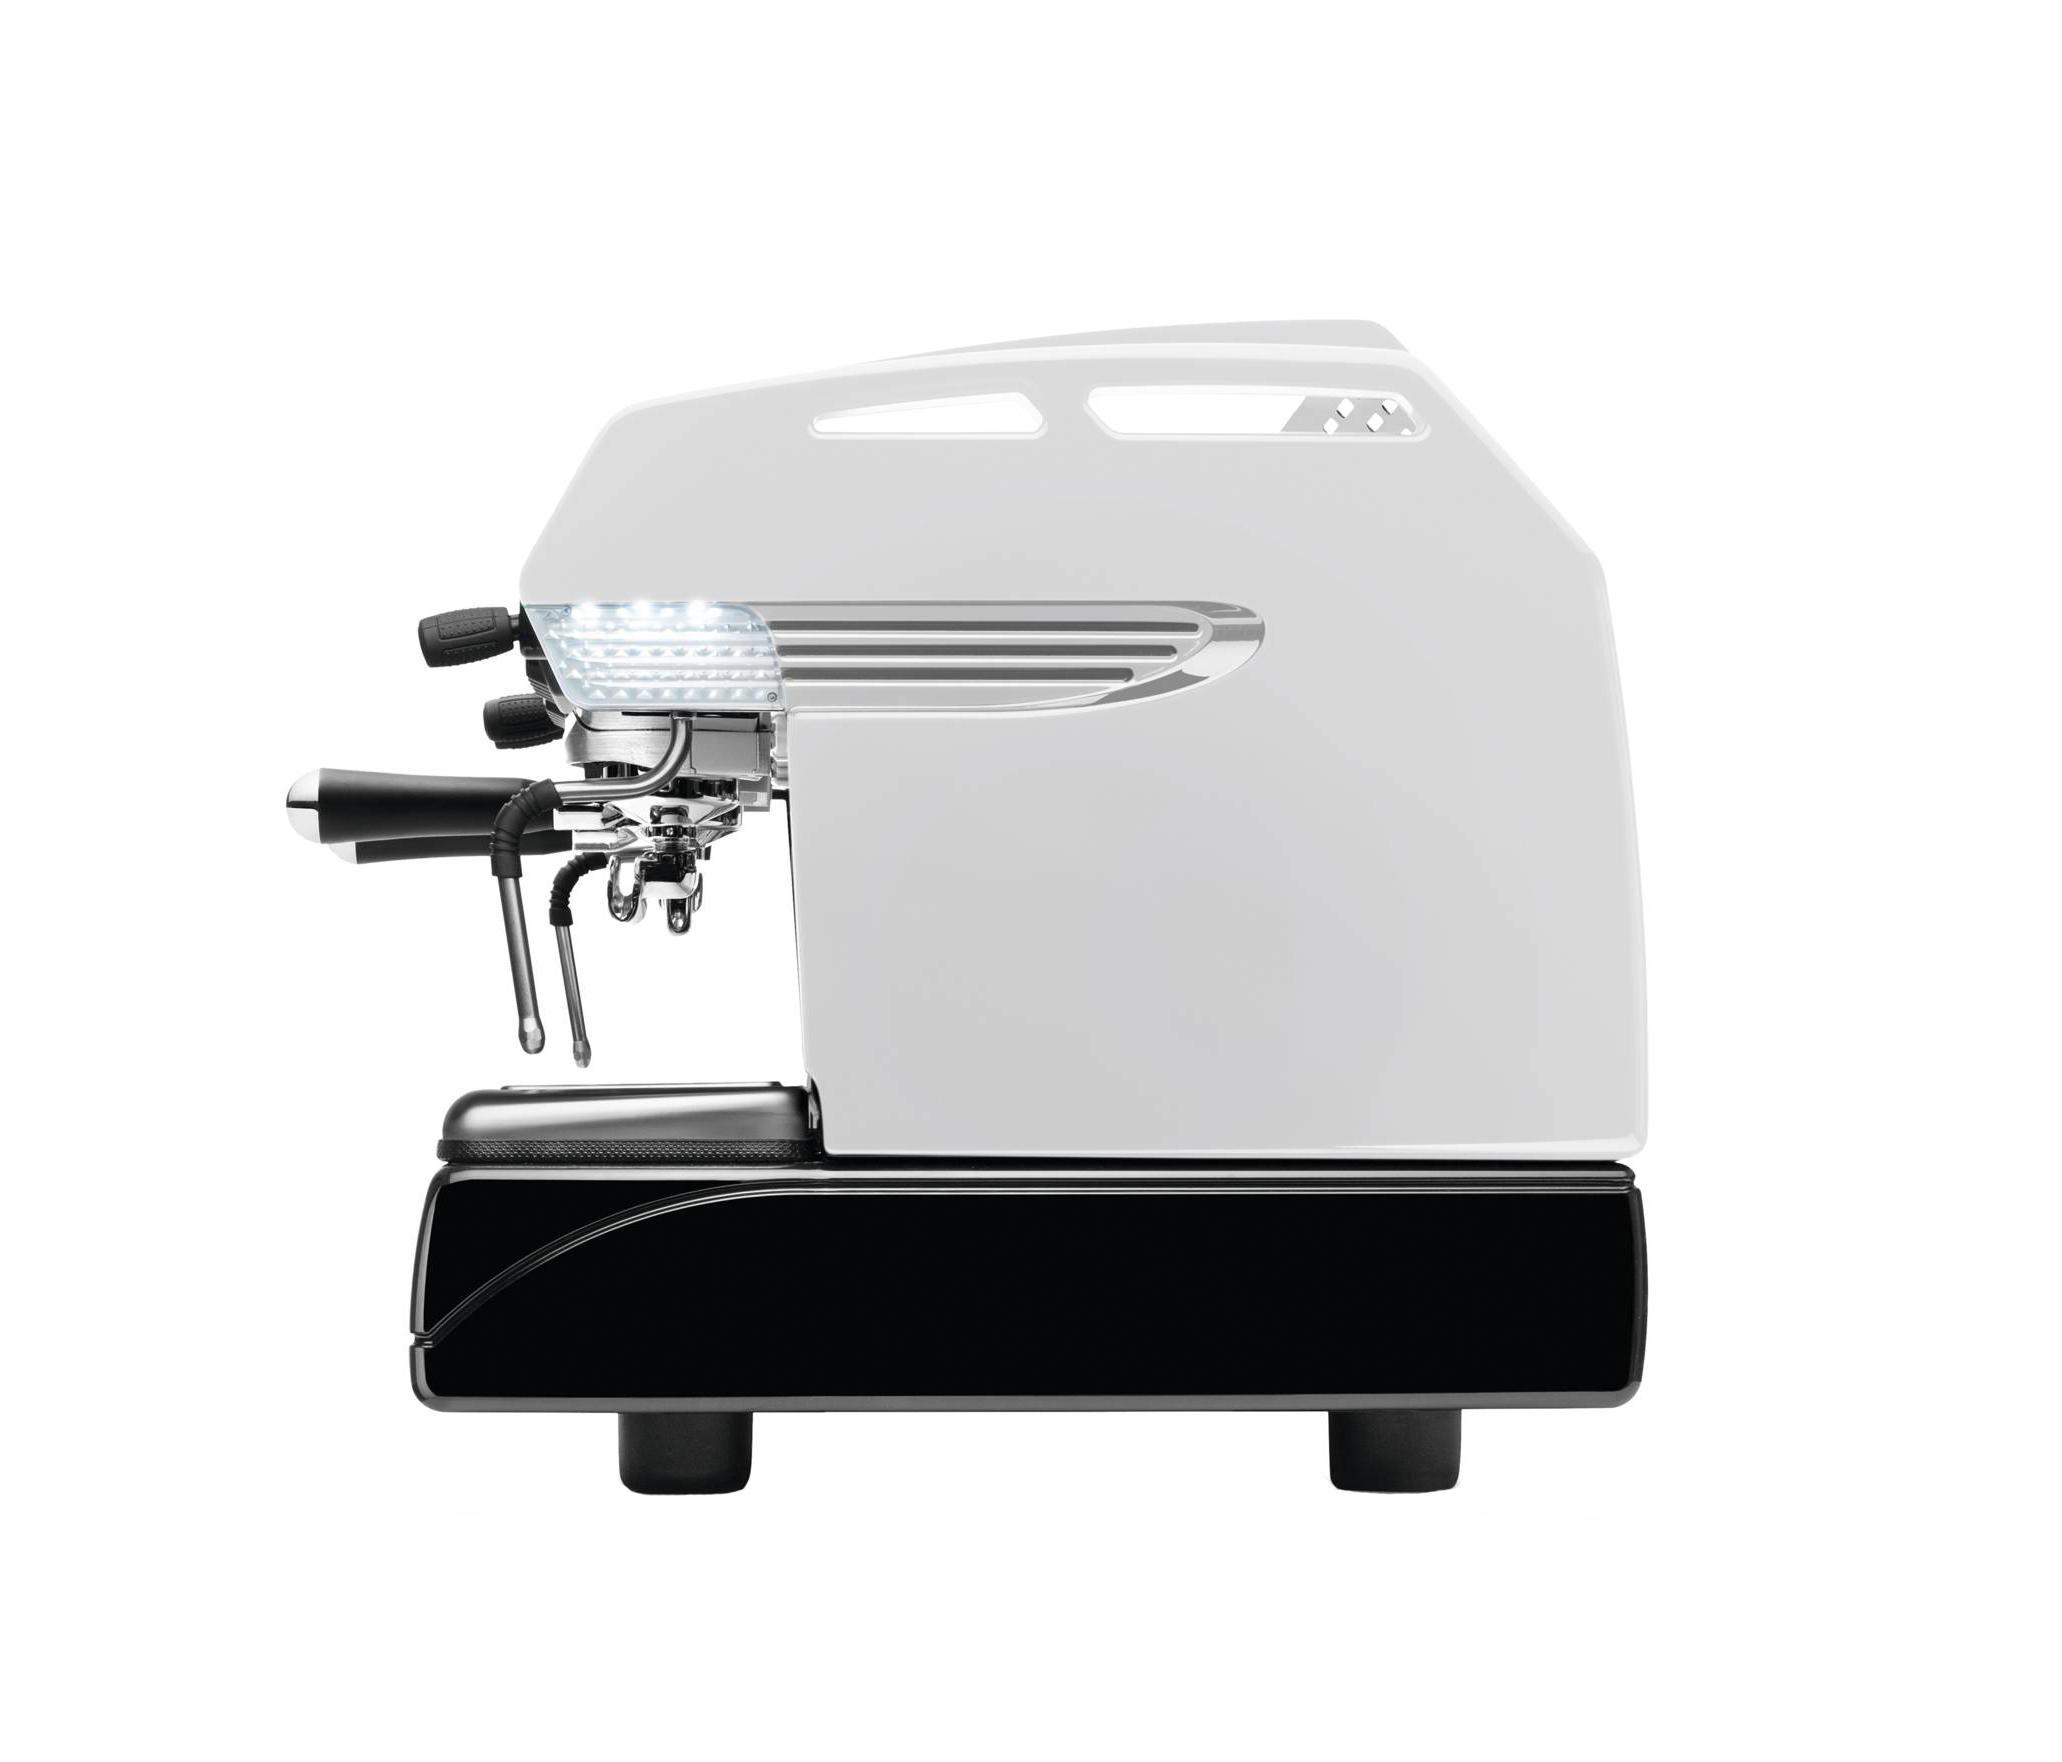 t400 kaffeemaschinen von franke kaffeemaschinen ag architonic. Black Bedroom Furniture Sets. Home Design Ideas